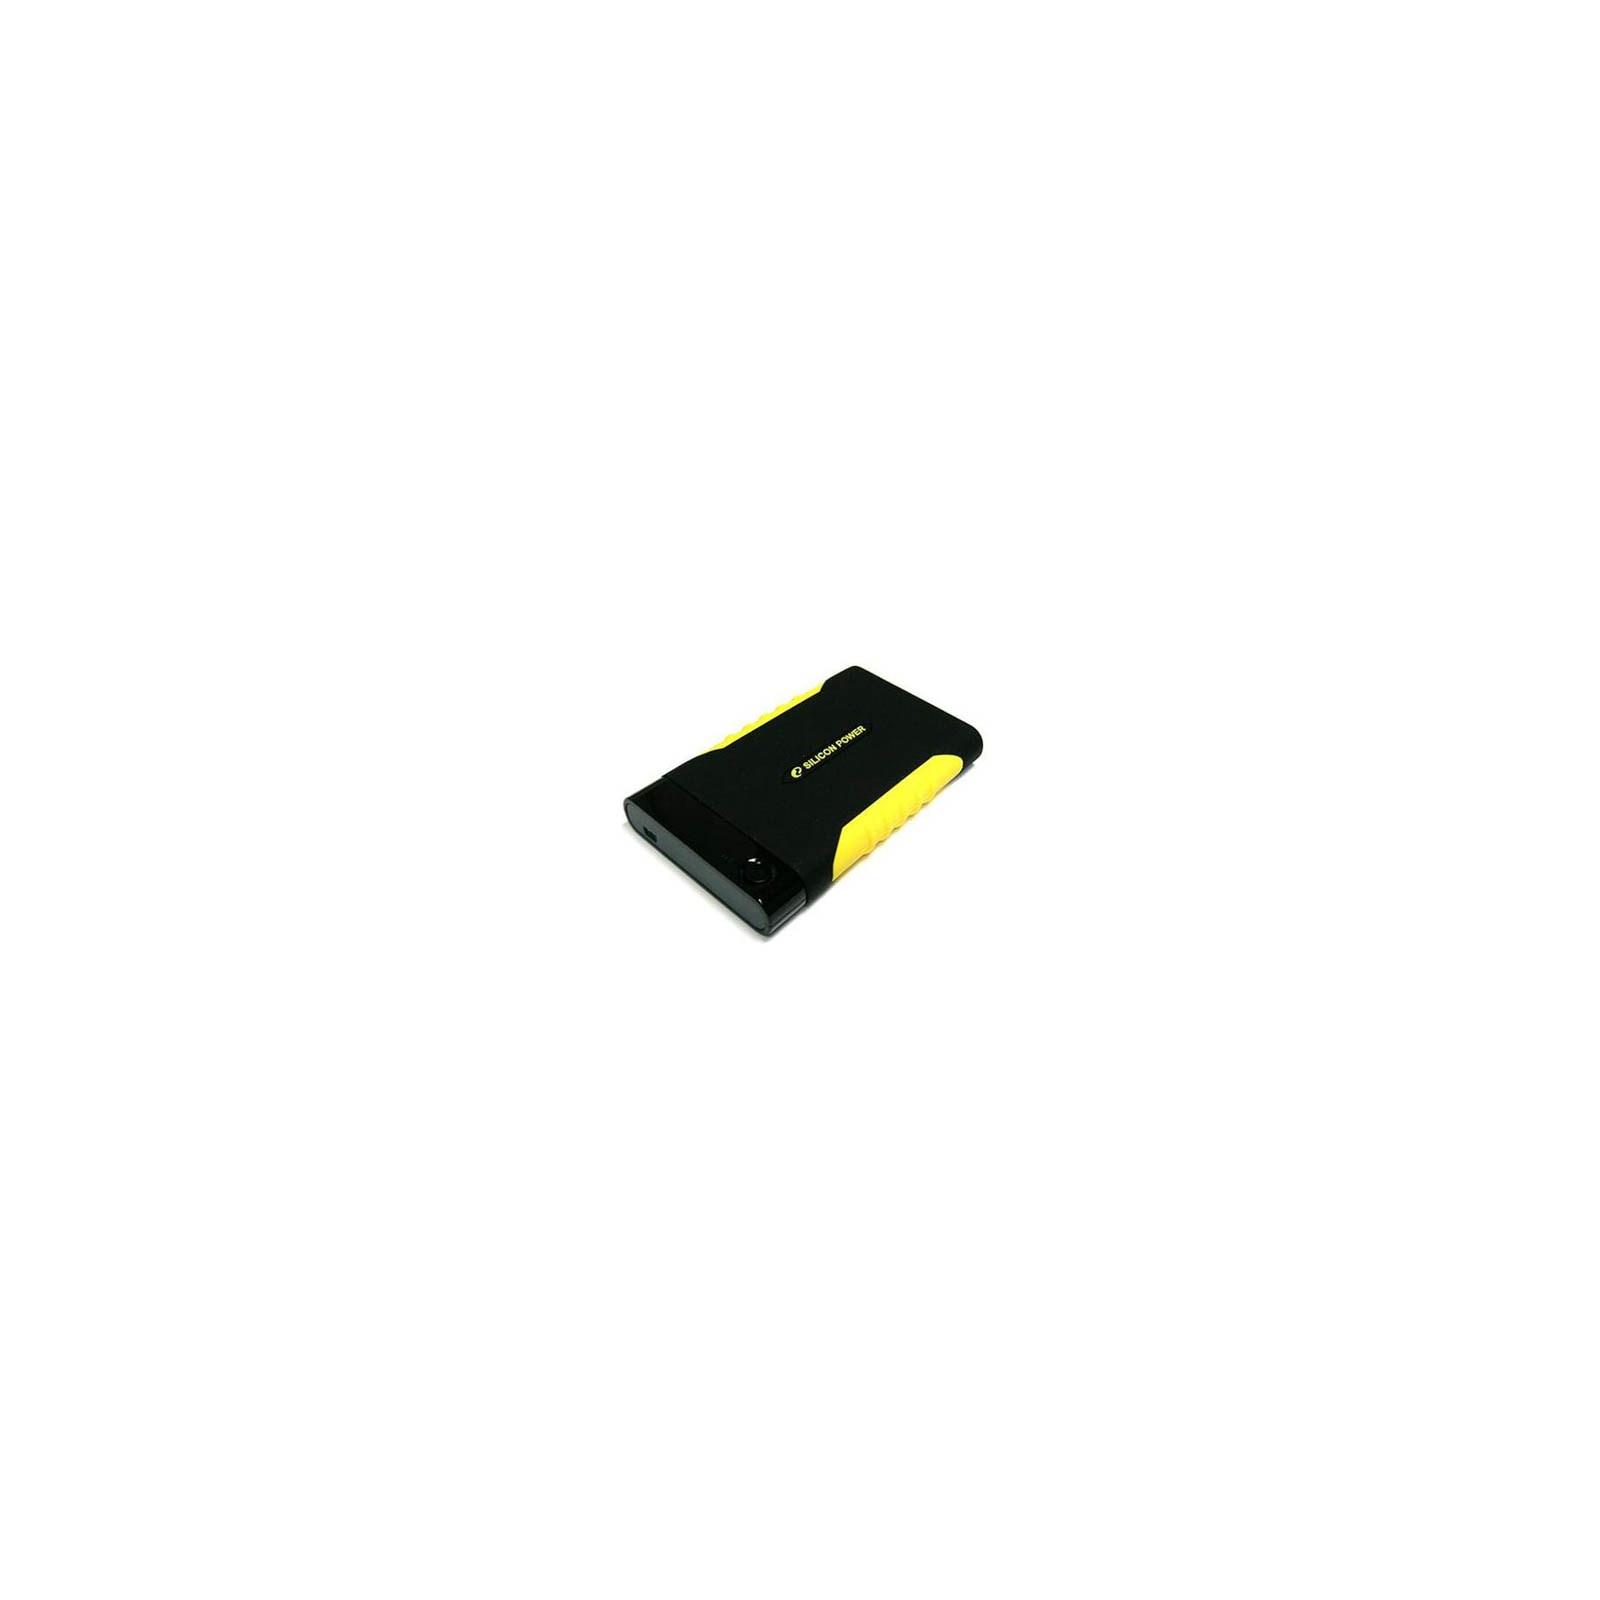 "Внешний жесткий диск 2.5"" 1TB Silicon Power (SP010TBPHDA10S2K)"